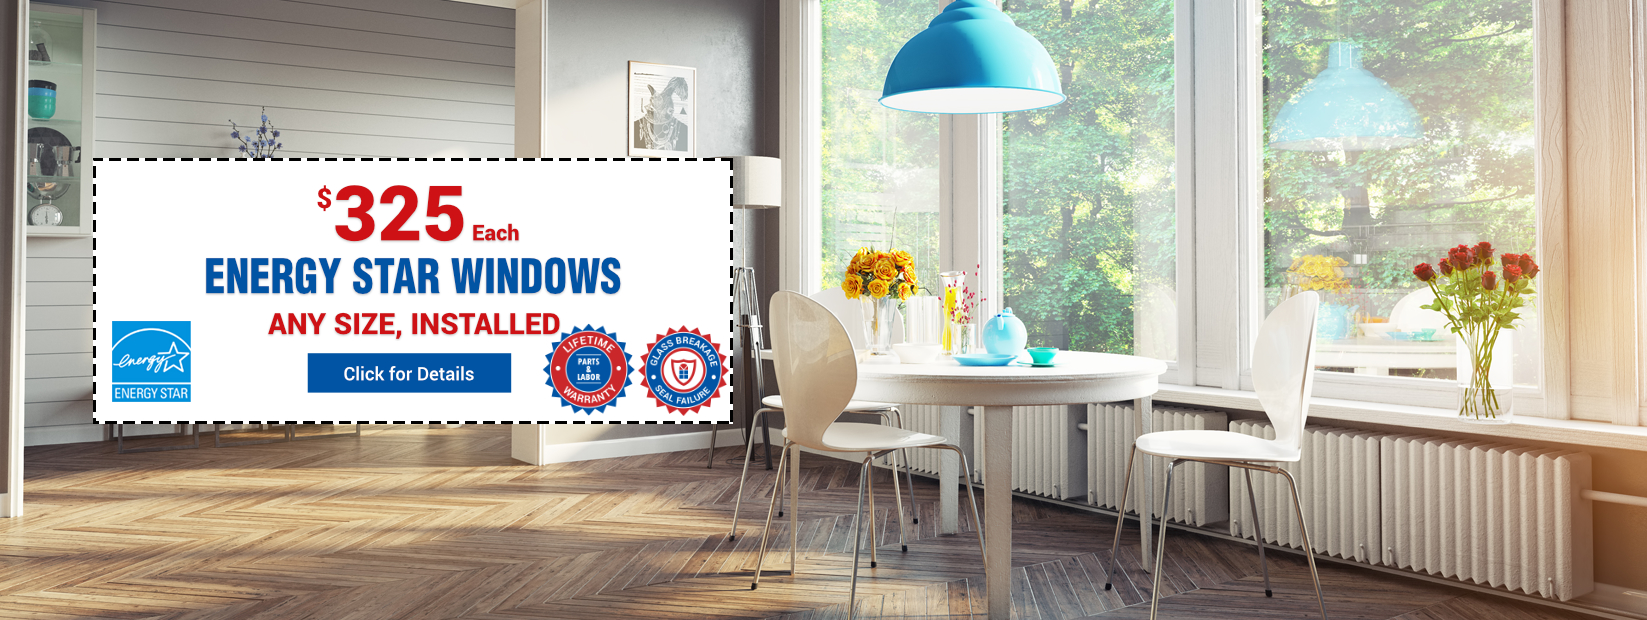 Energy Star Windows at $279